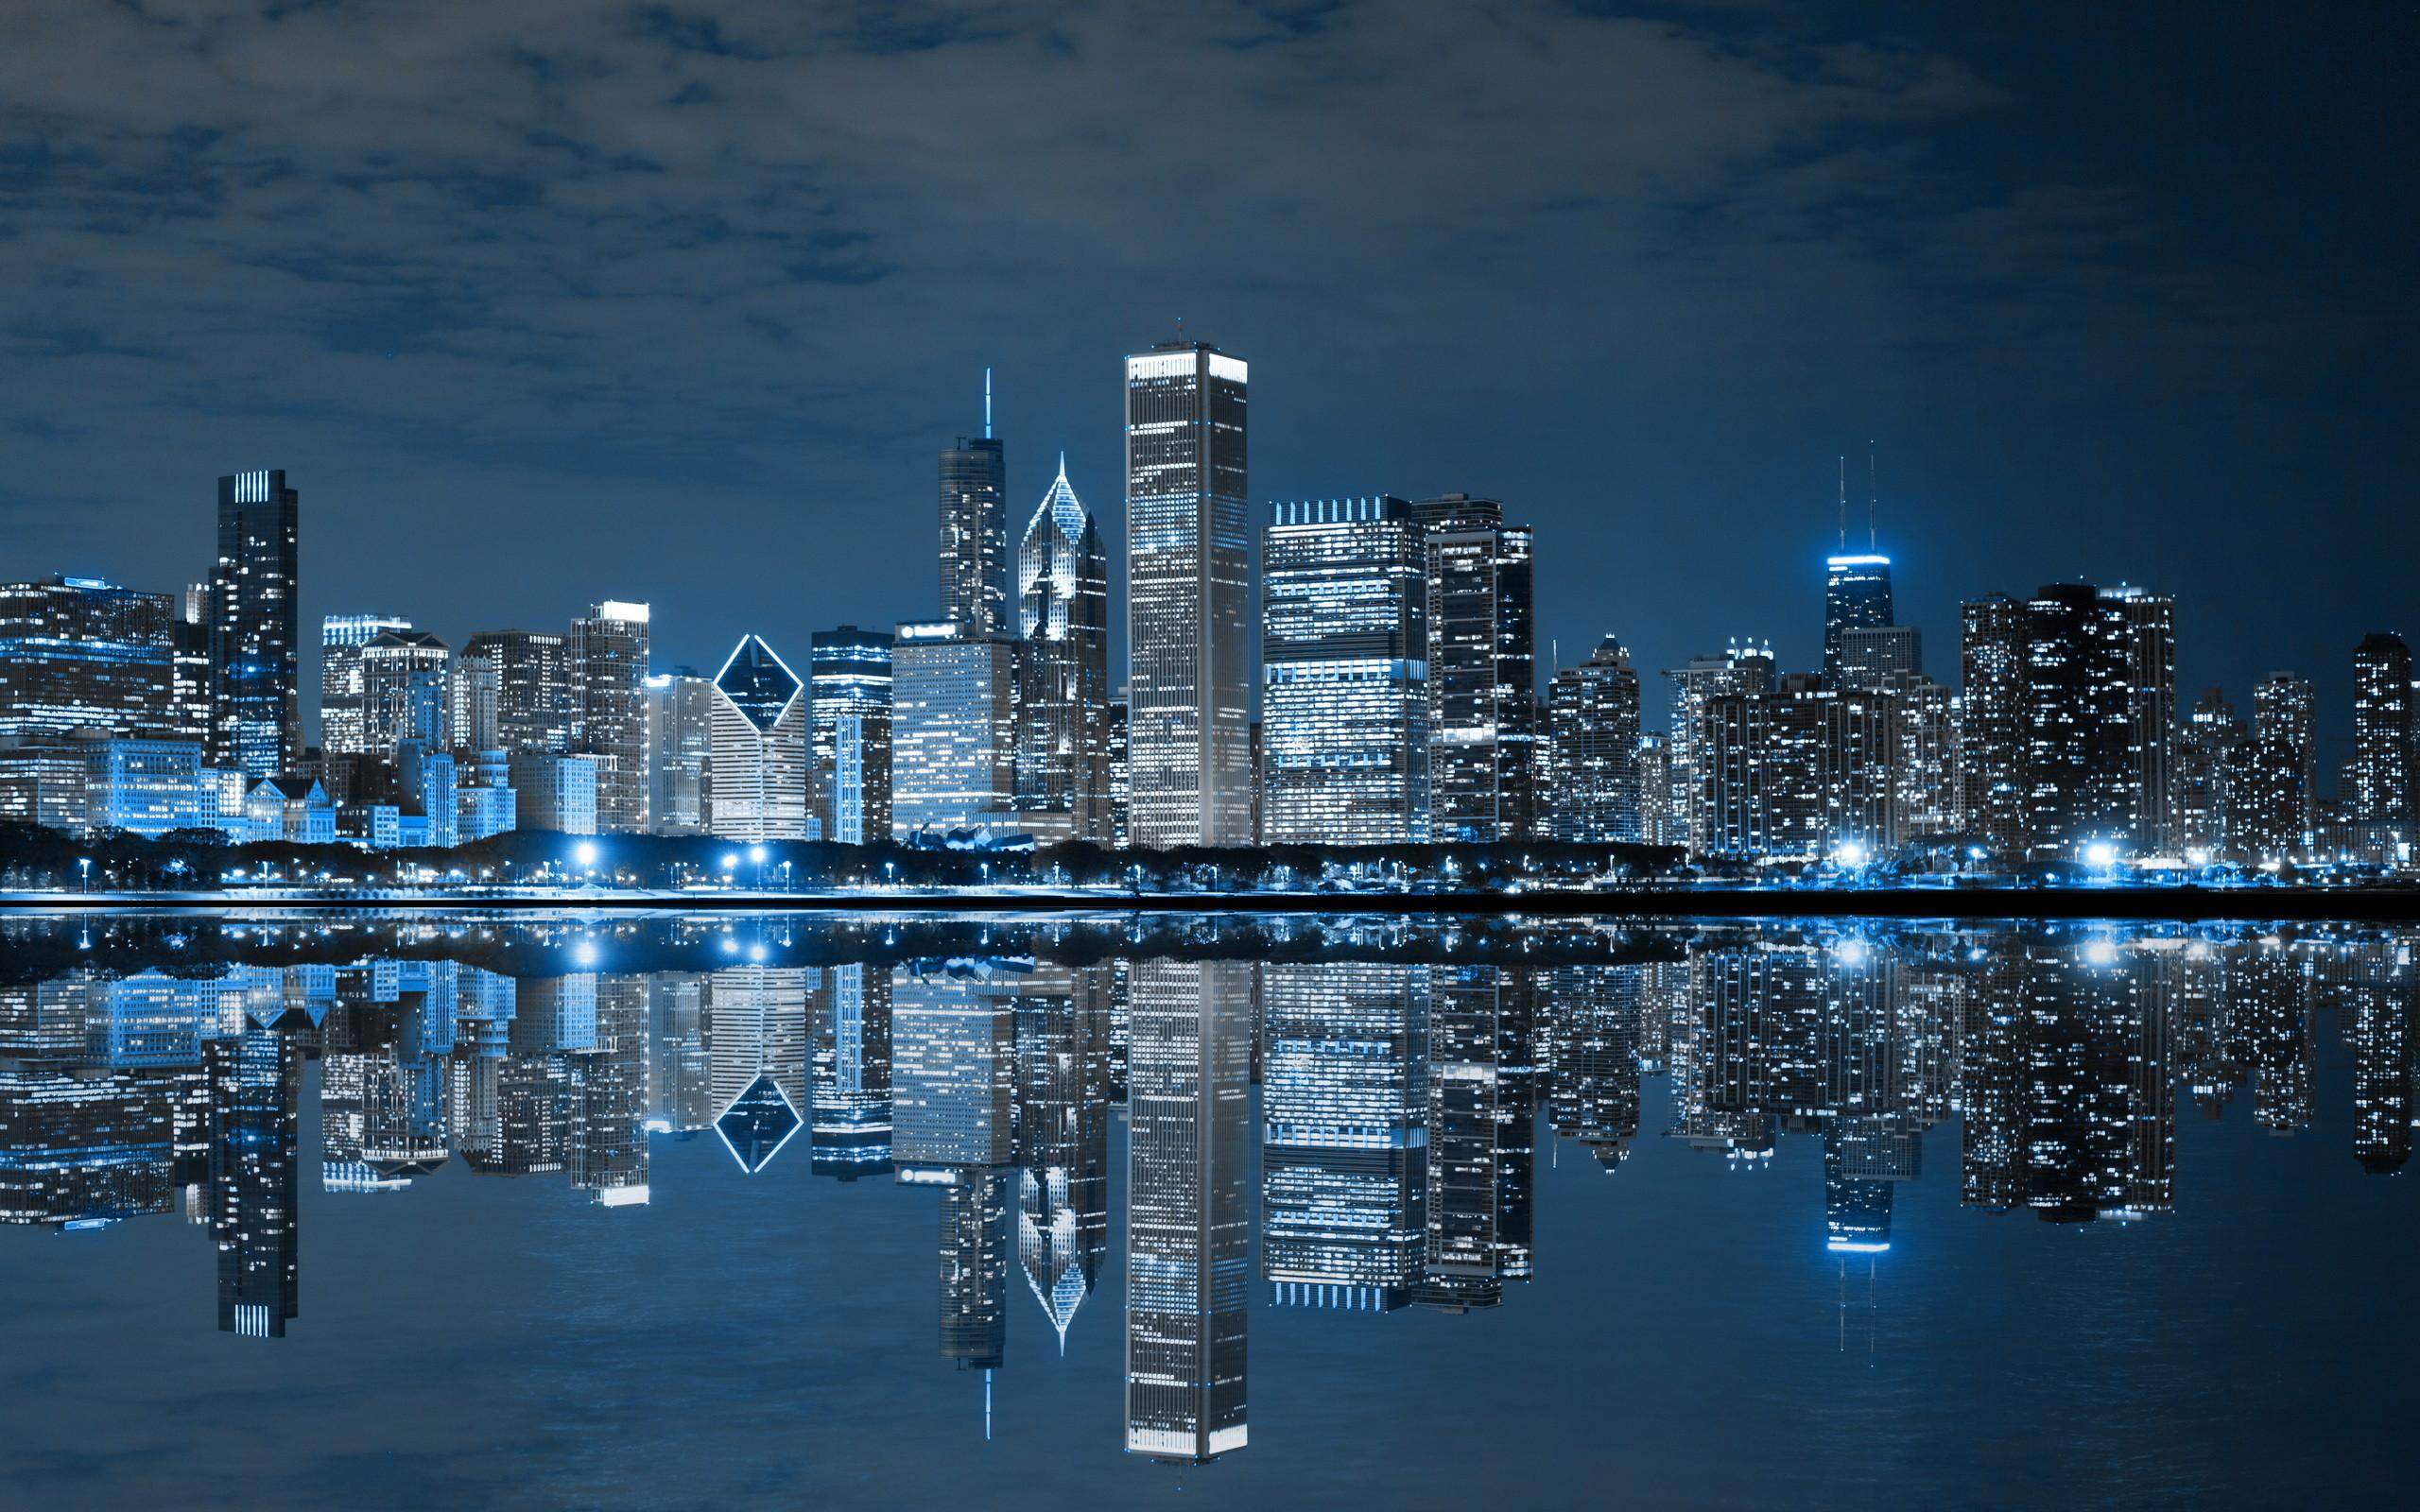 chicago wallpaper hd ·①